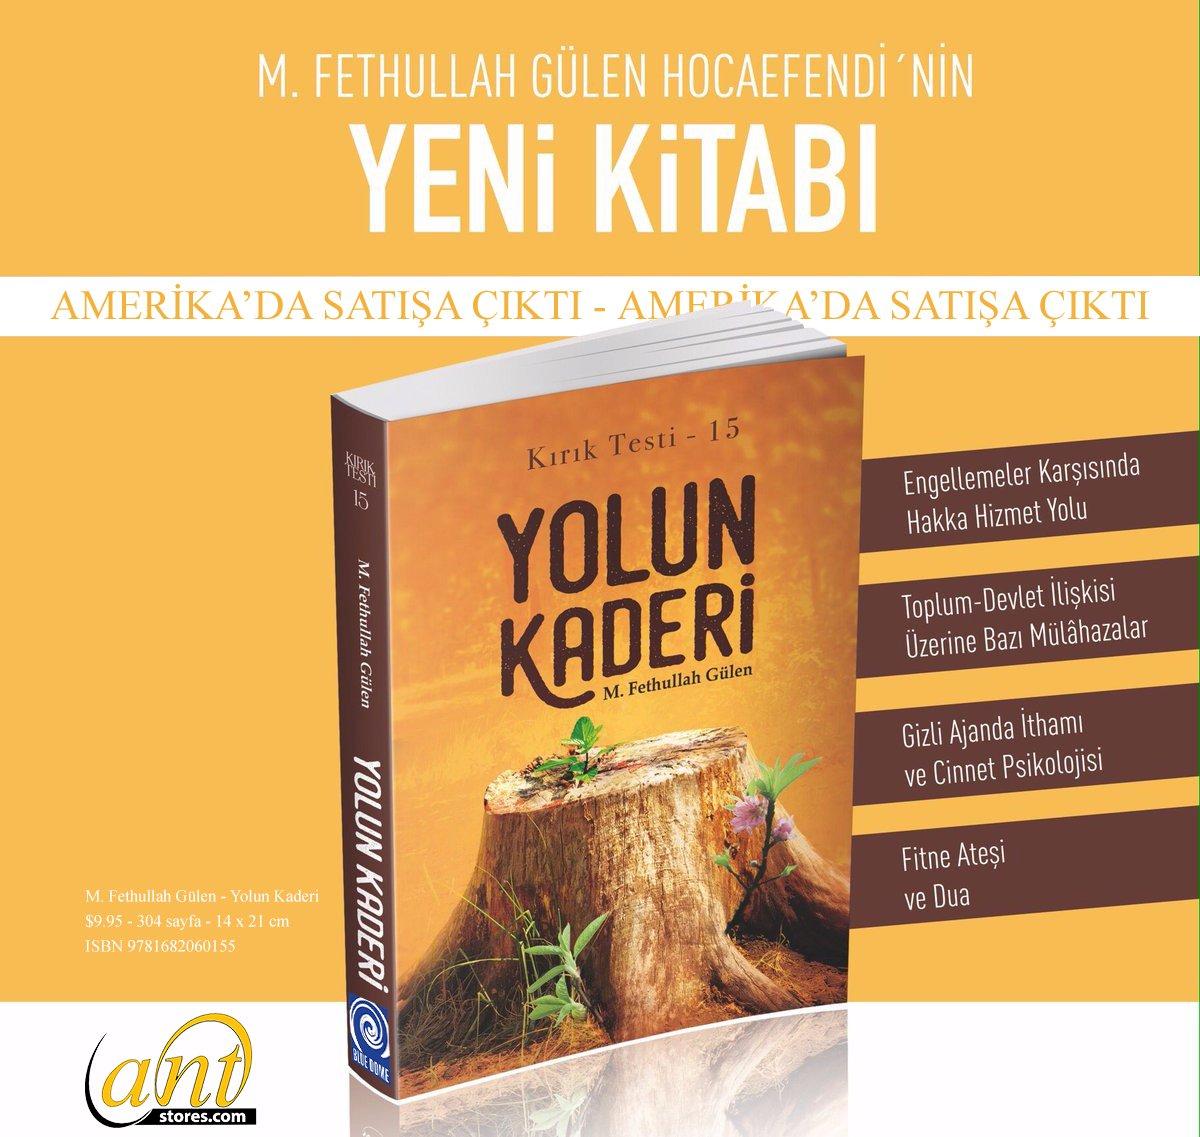 "Bayram hediyeniz ANTstores'dan! Hocaefendi'nin son kitabı ""Yolun Kaderi"" Amerikada raflarda. https://t.co/ruvPy4plV7 https://t.co/R3rtEmkqfC"